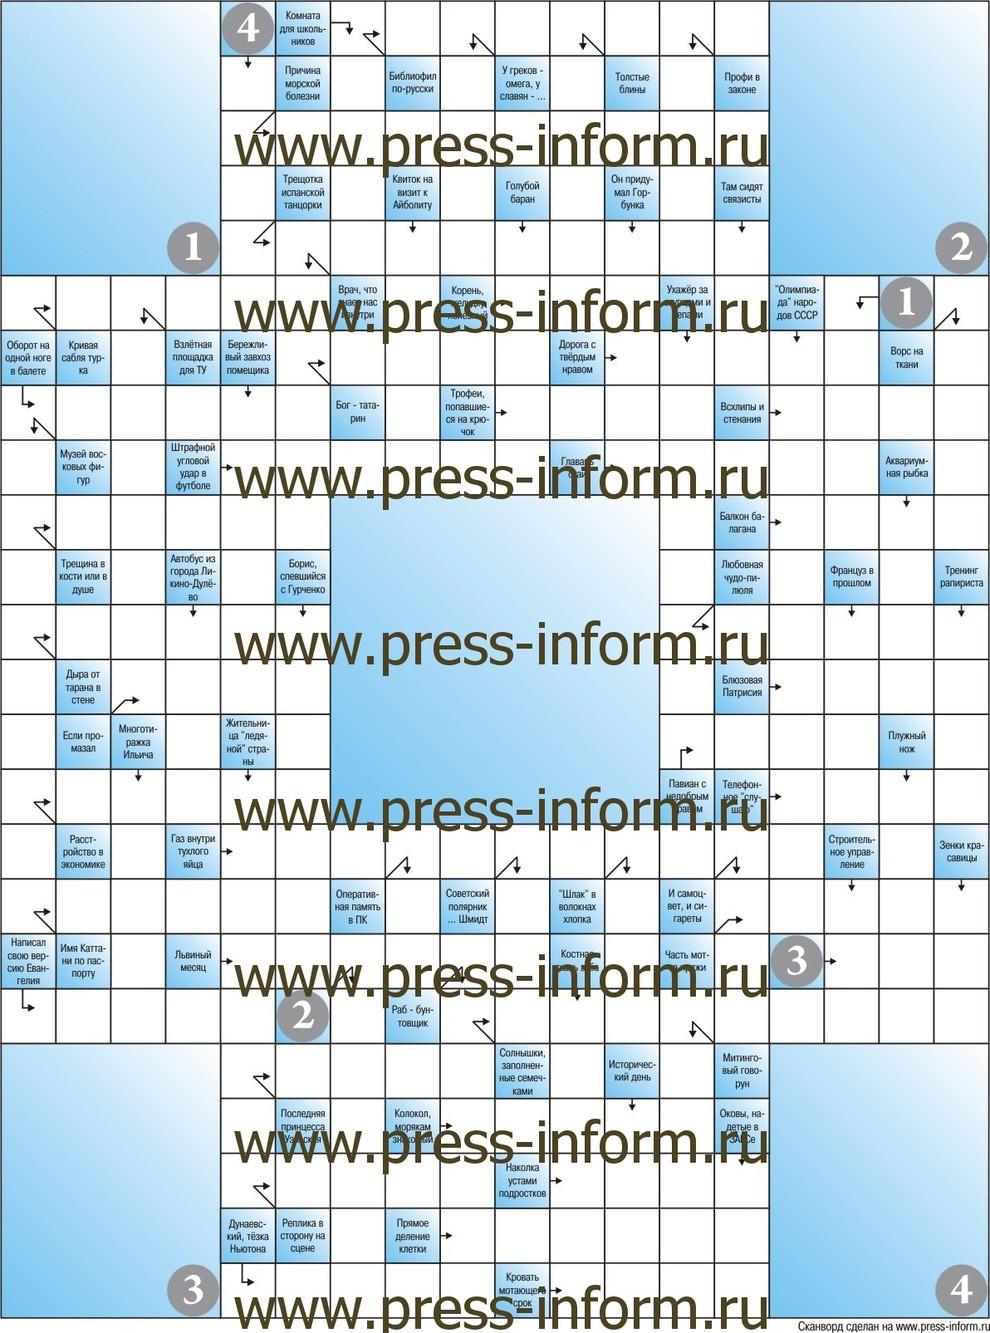 Сканворд В2  kx клеток, 4 картинки 4x5, пустой блок 6x6